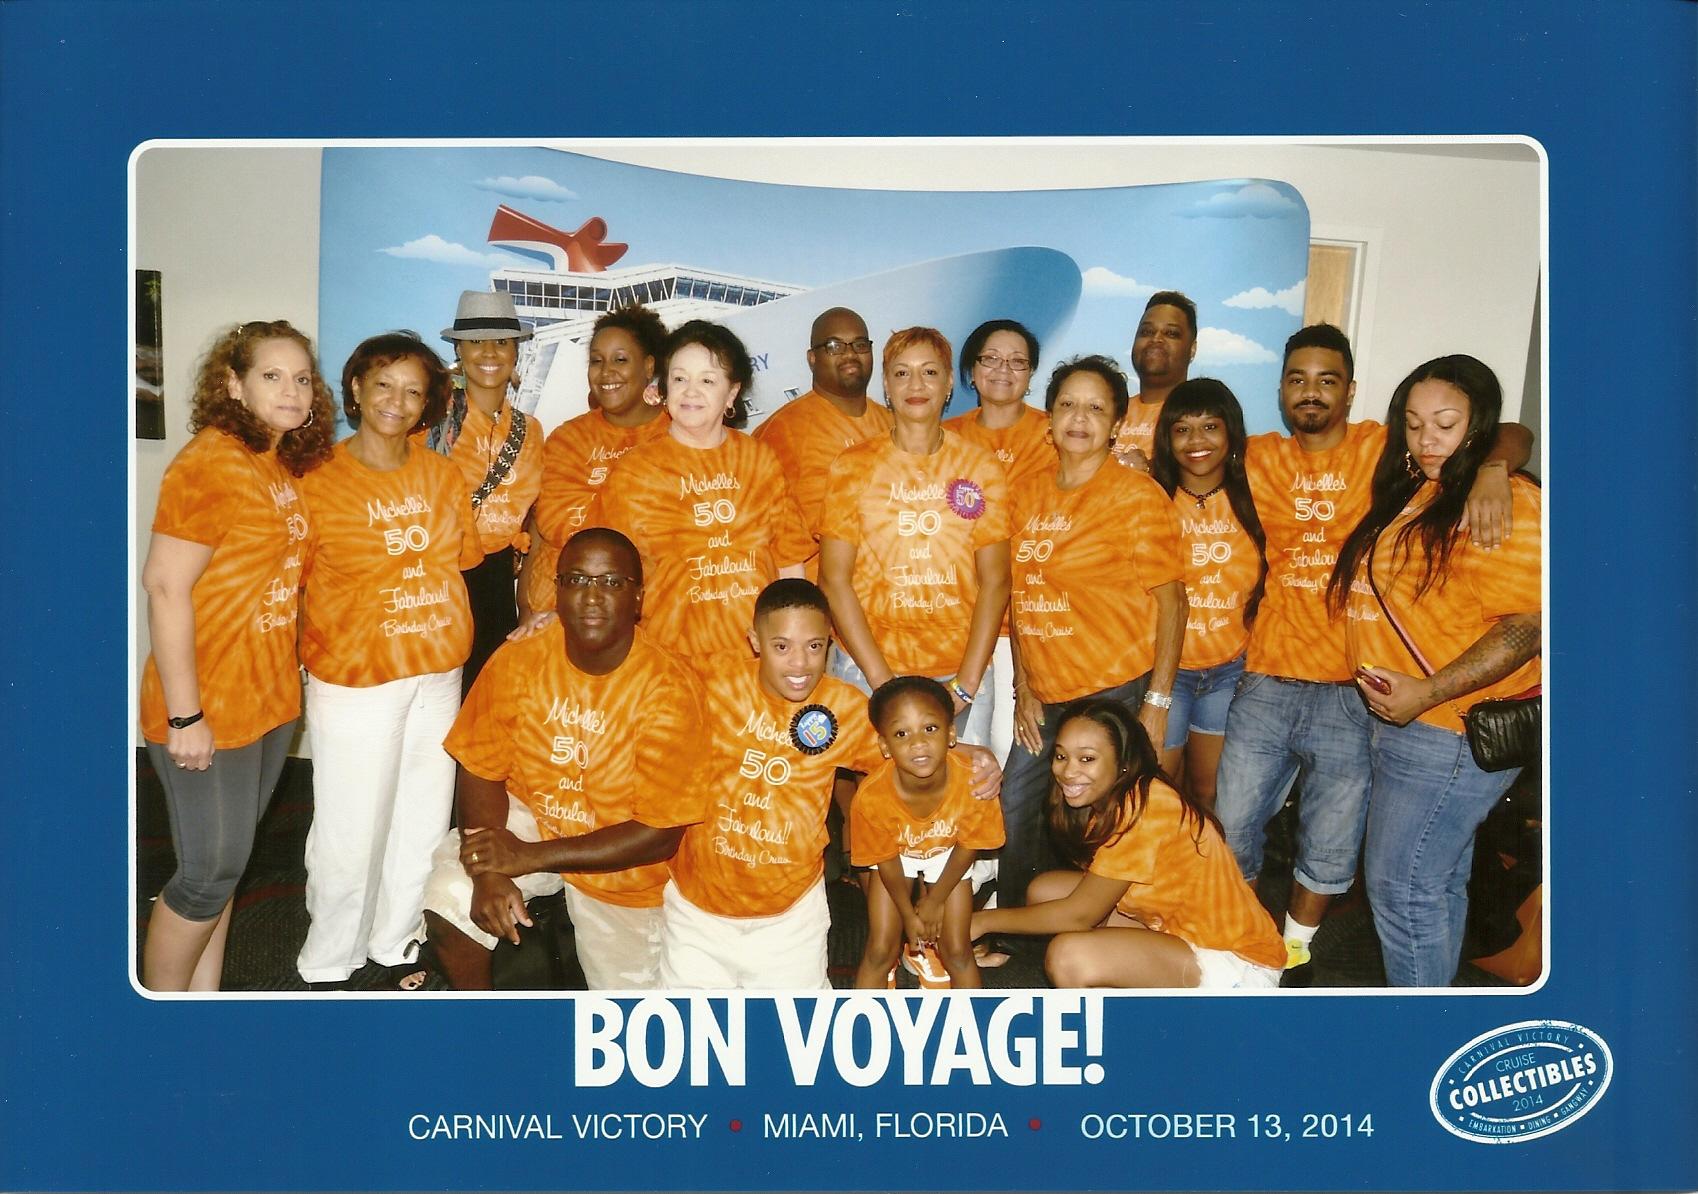 Design your own t-shirt miami - Michelle S 50 Fabulous Birthday Cruise T Shirt Photo